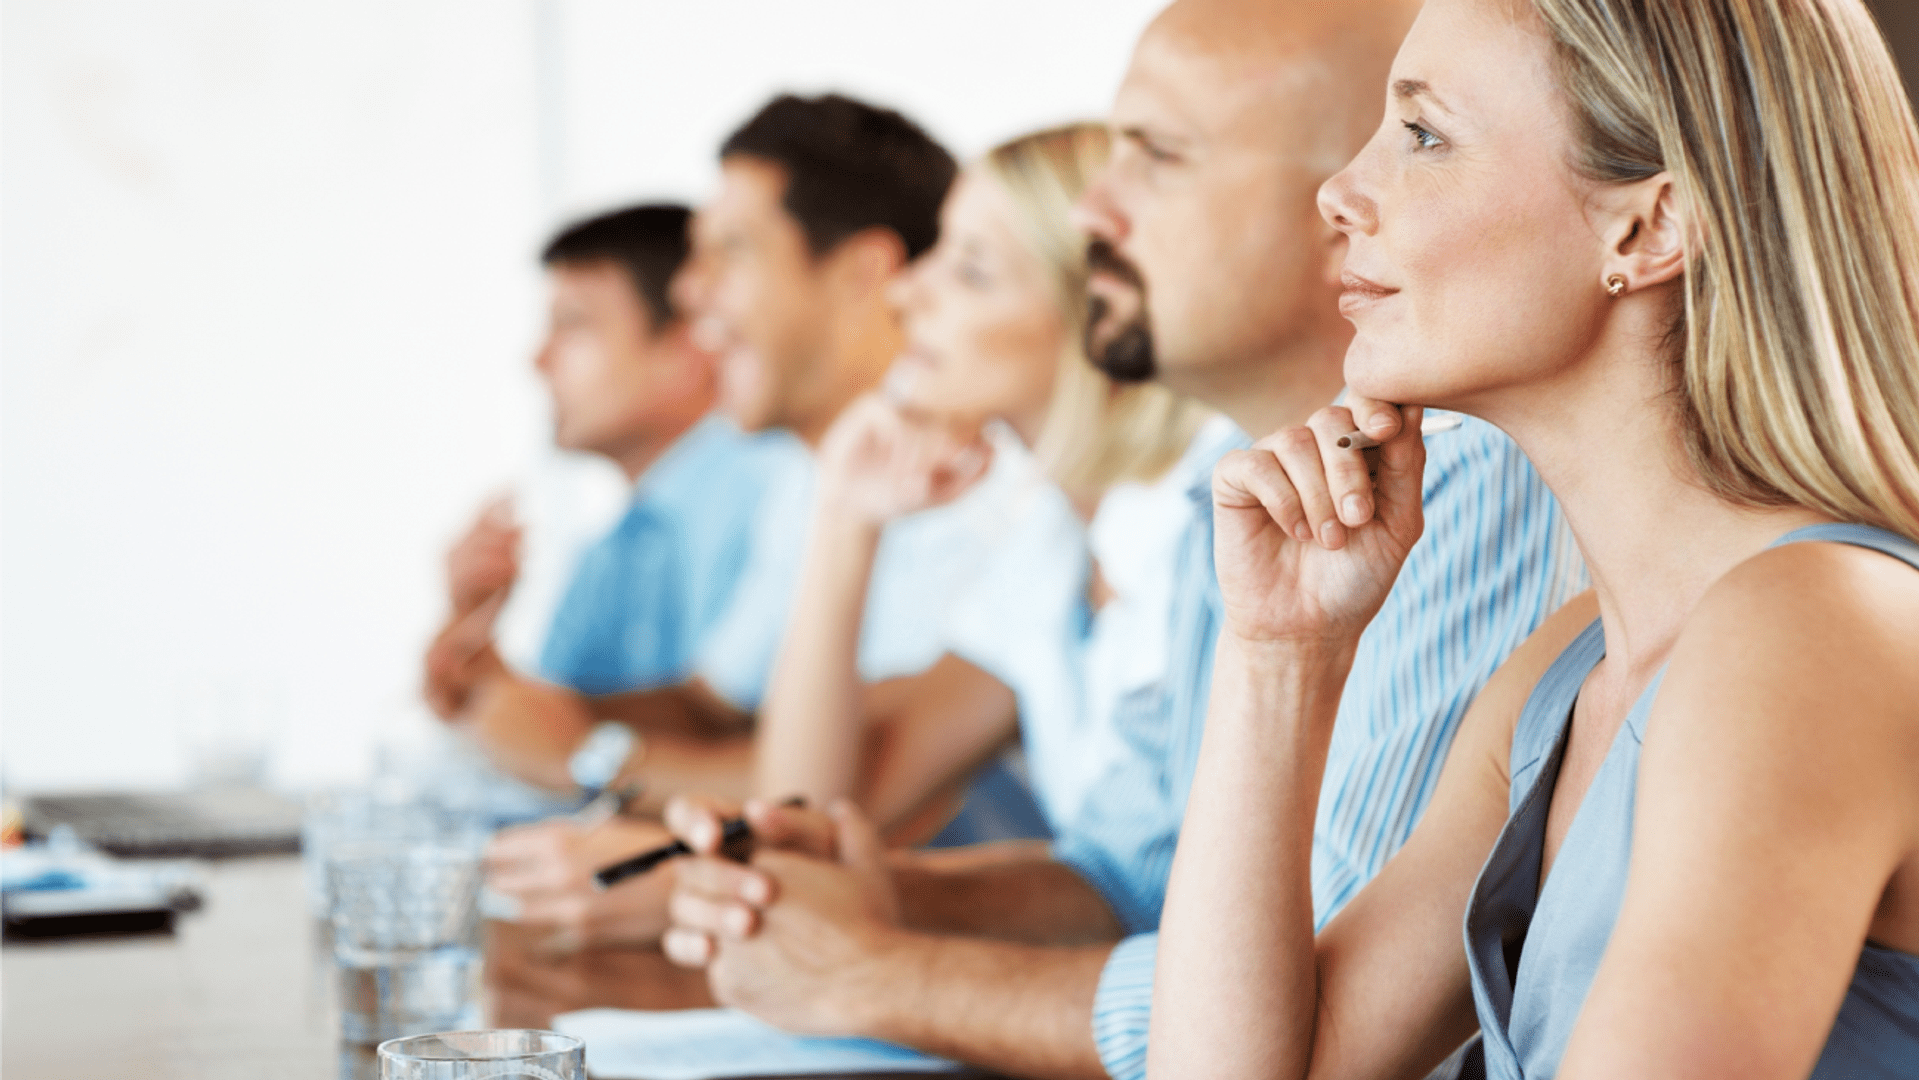 courses, lessons, group, participants, company, language, private, travel